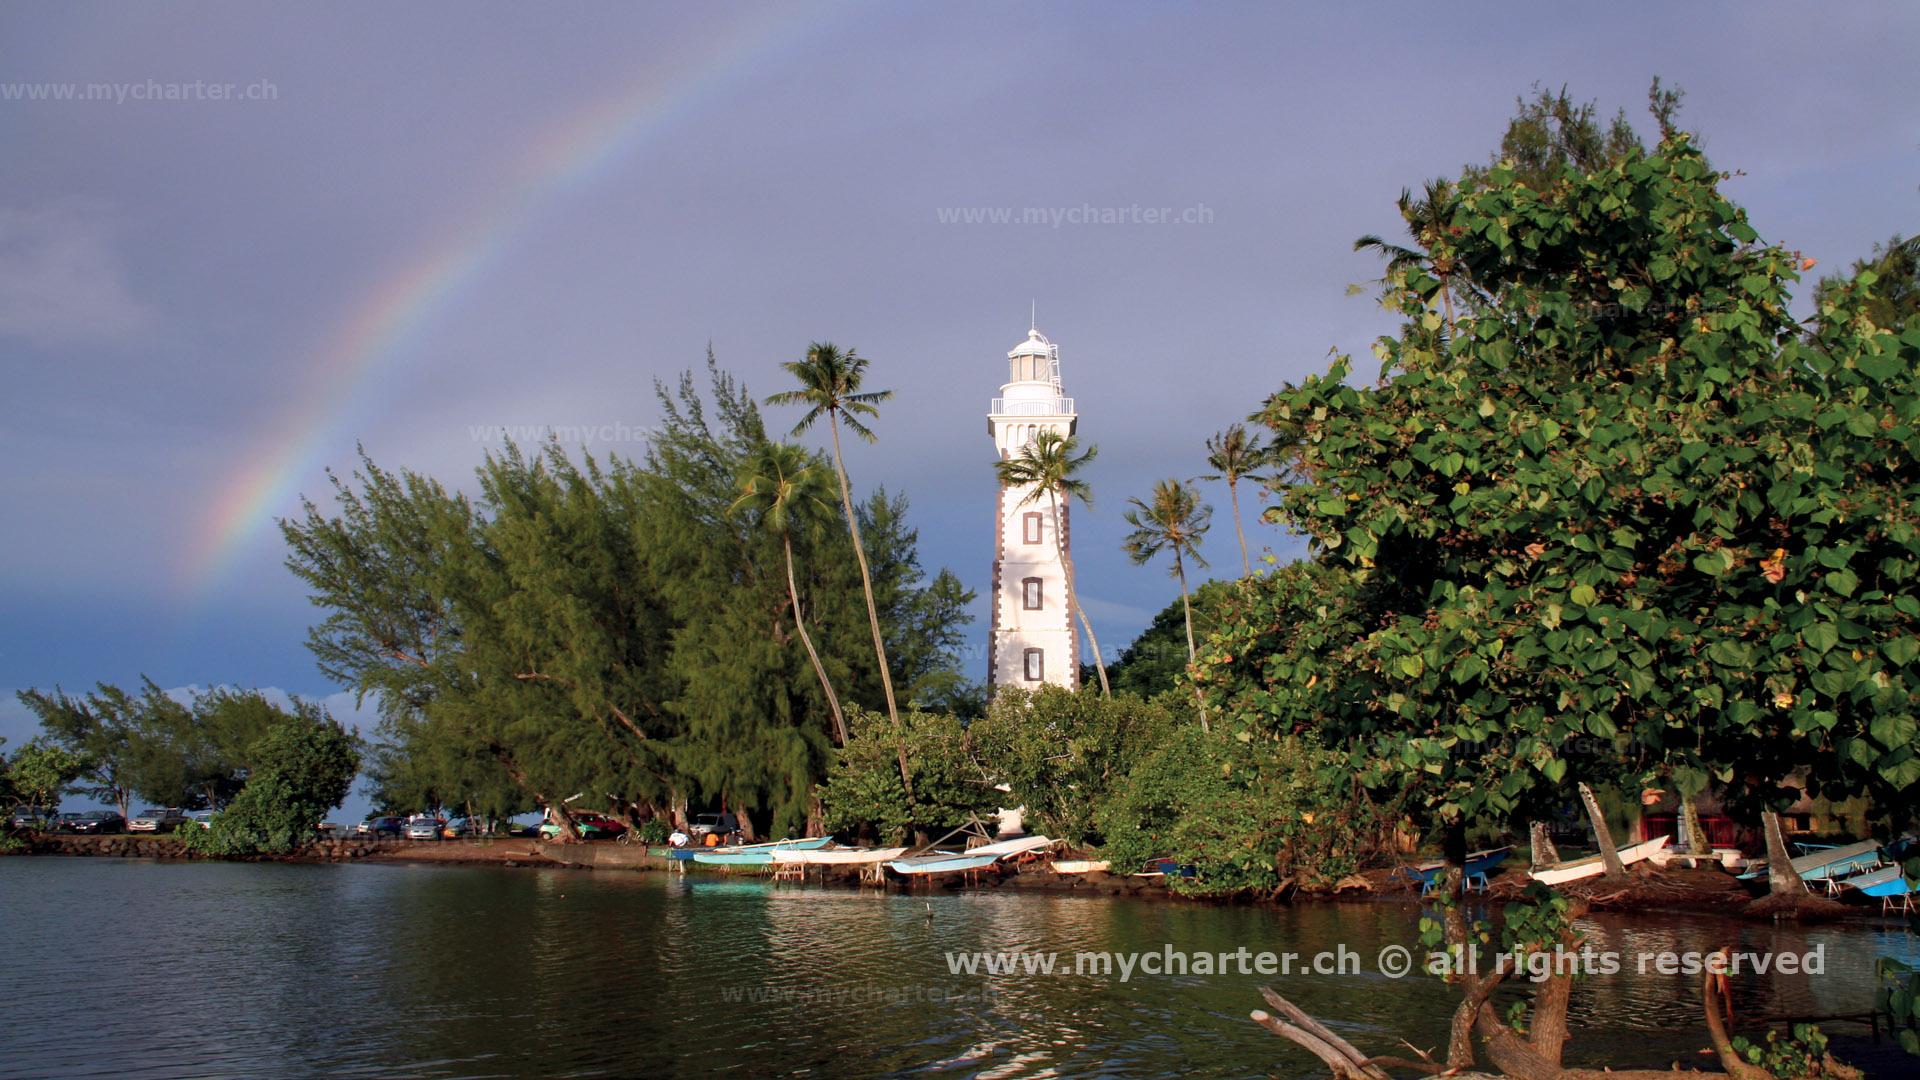 Yachtcharter Südesee - Tahiti - Papeete